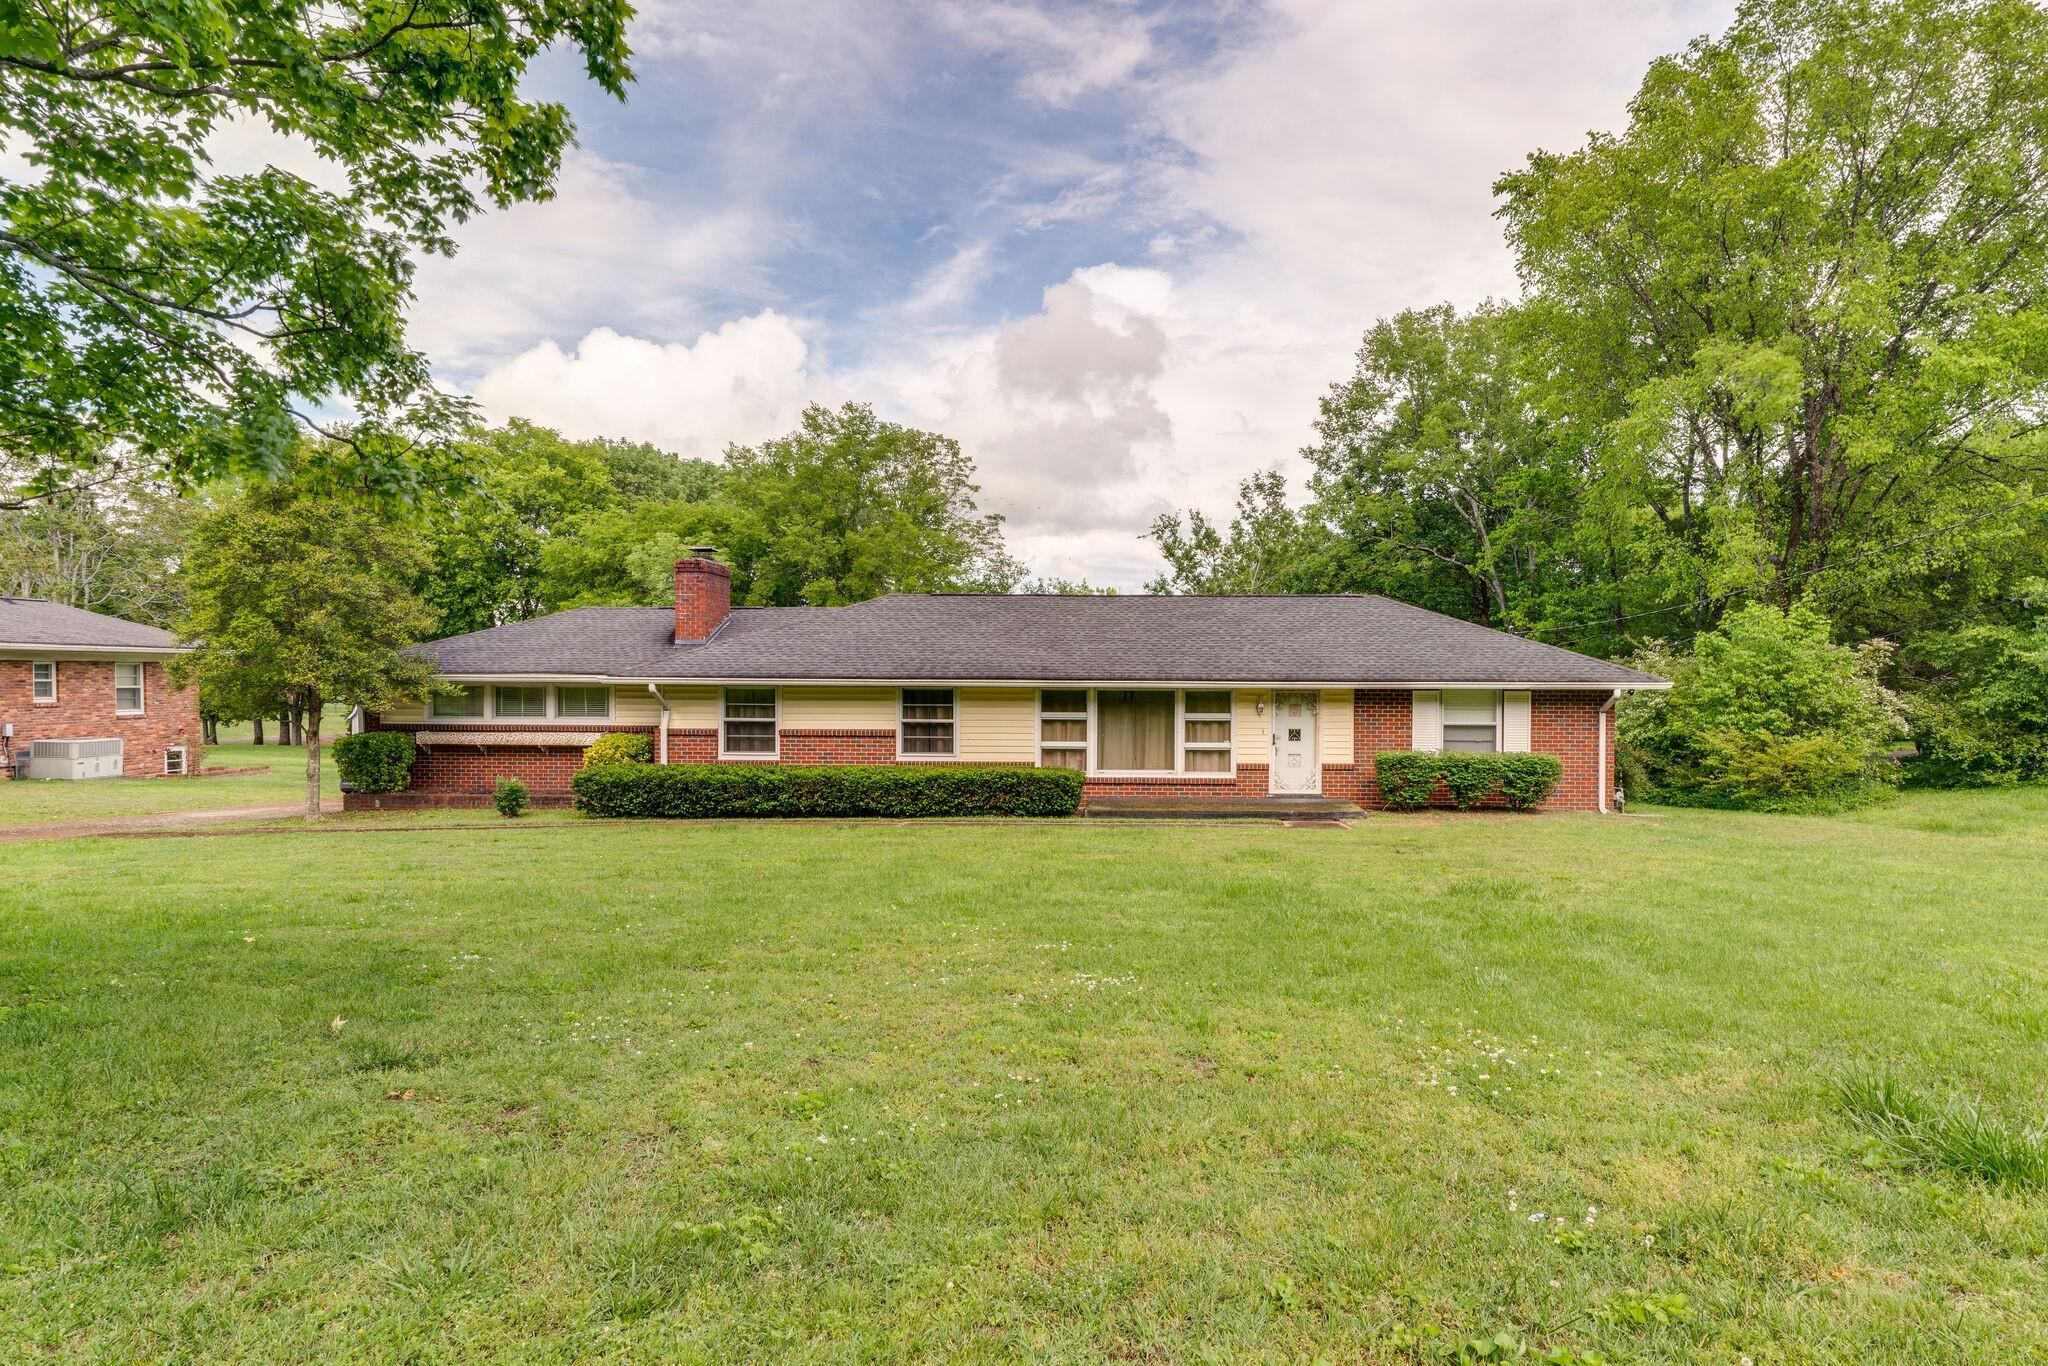 608 N Graycroft Ave Property Photo - Madison, TN real estate listing